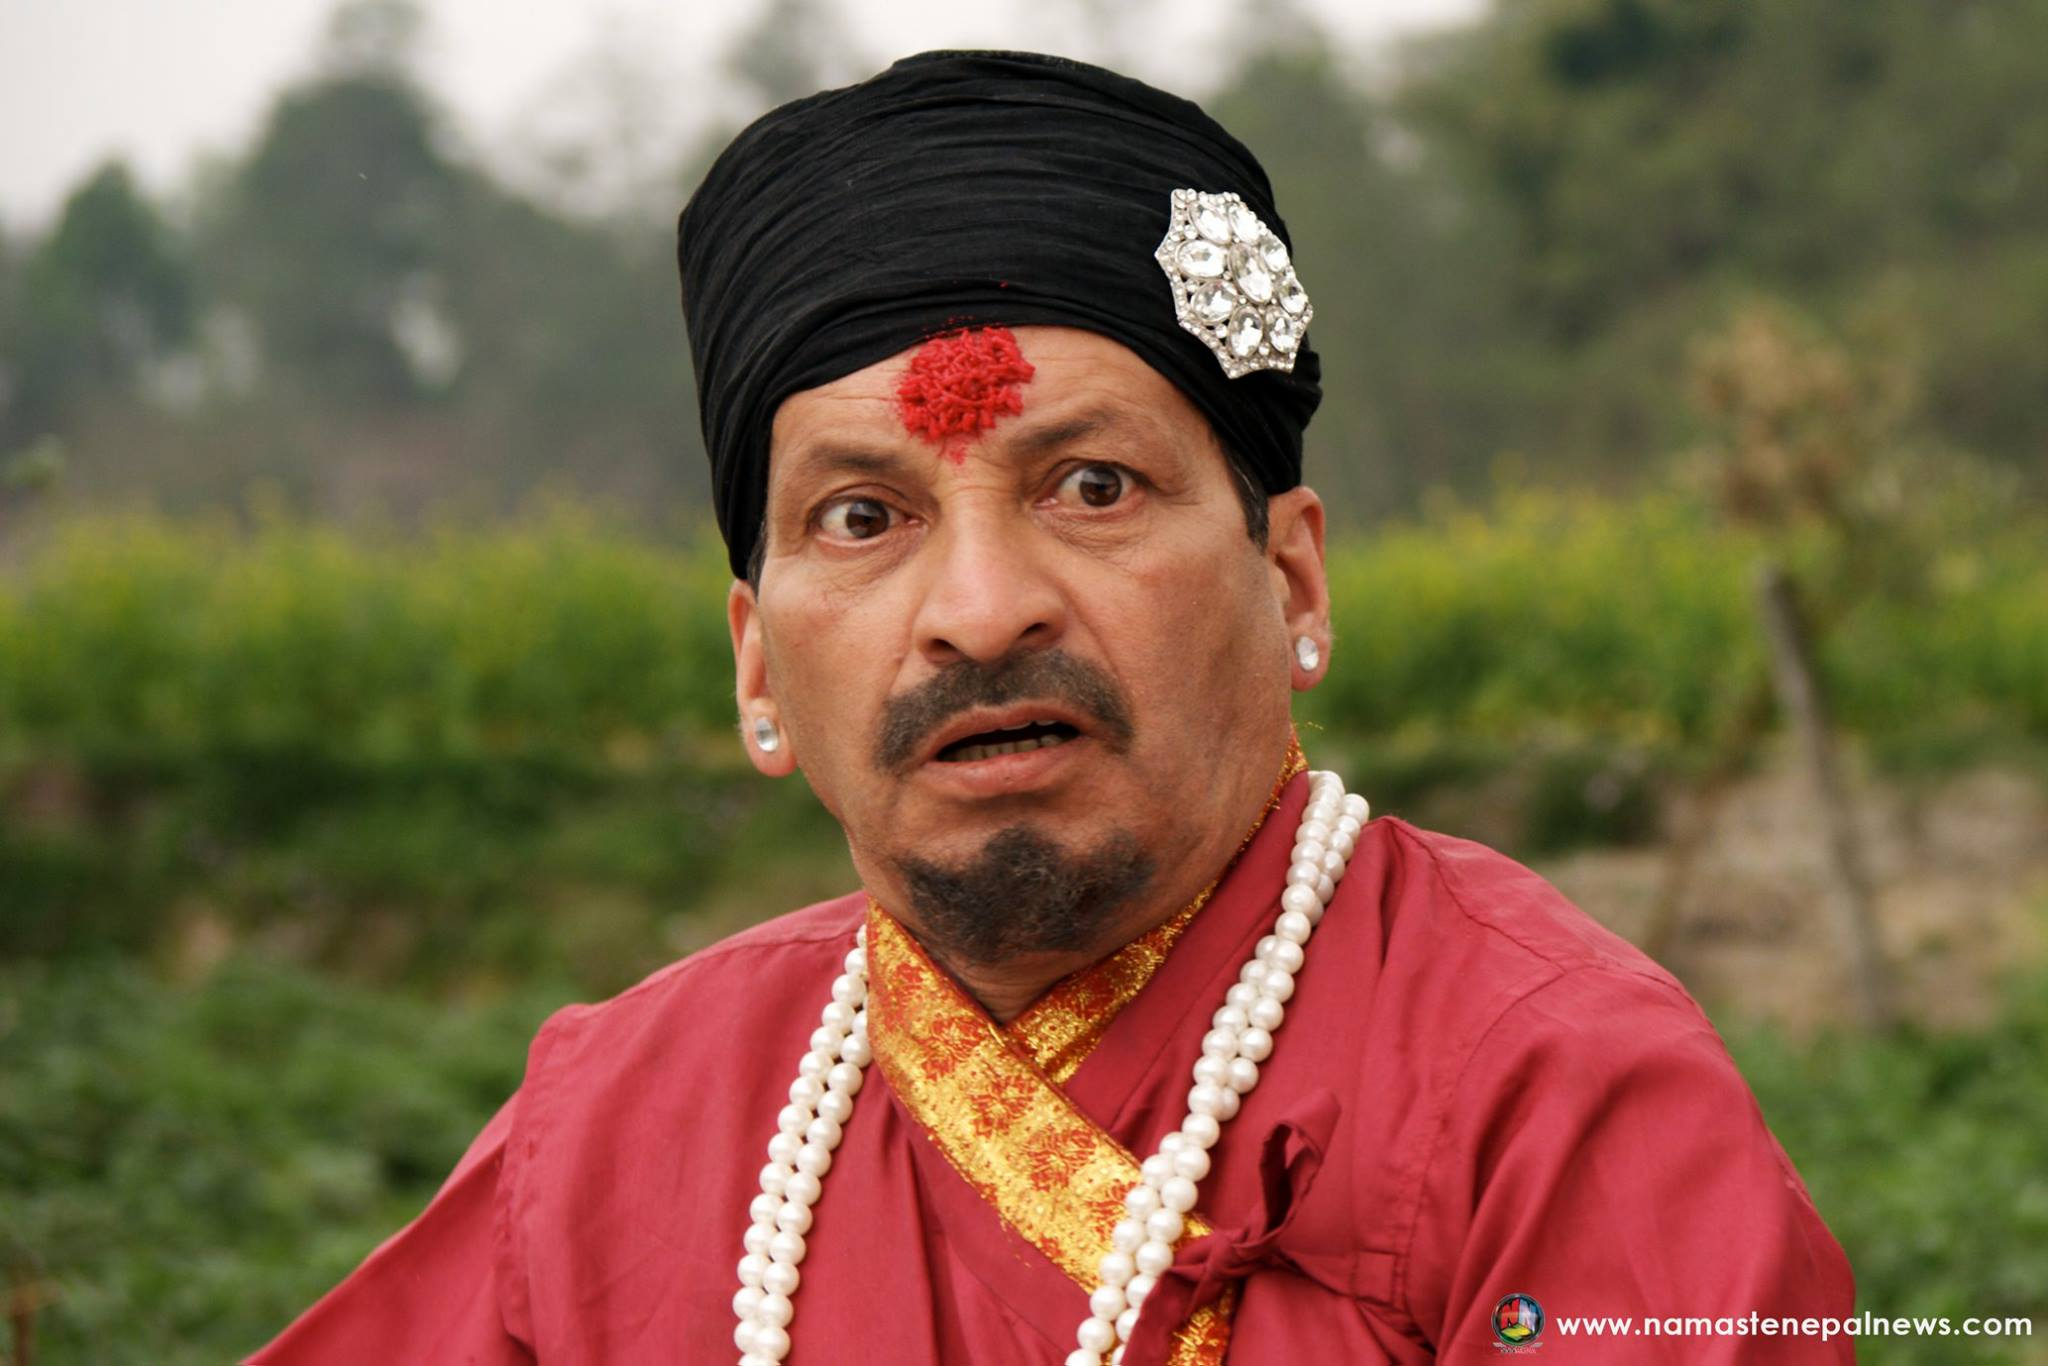 Seto Bagh Nepali Movie Images Gallery - Nepali Chalchitra Nepali Movie Song By Rekha Thapa